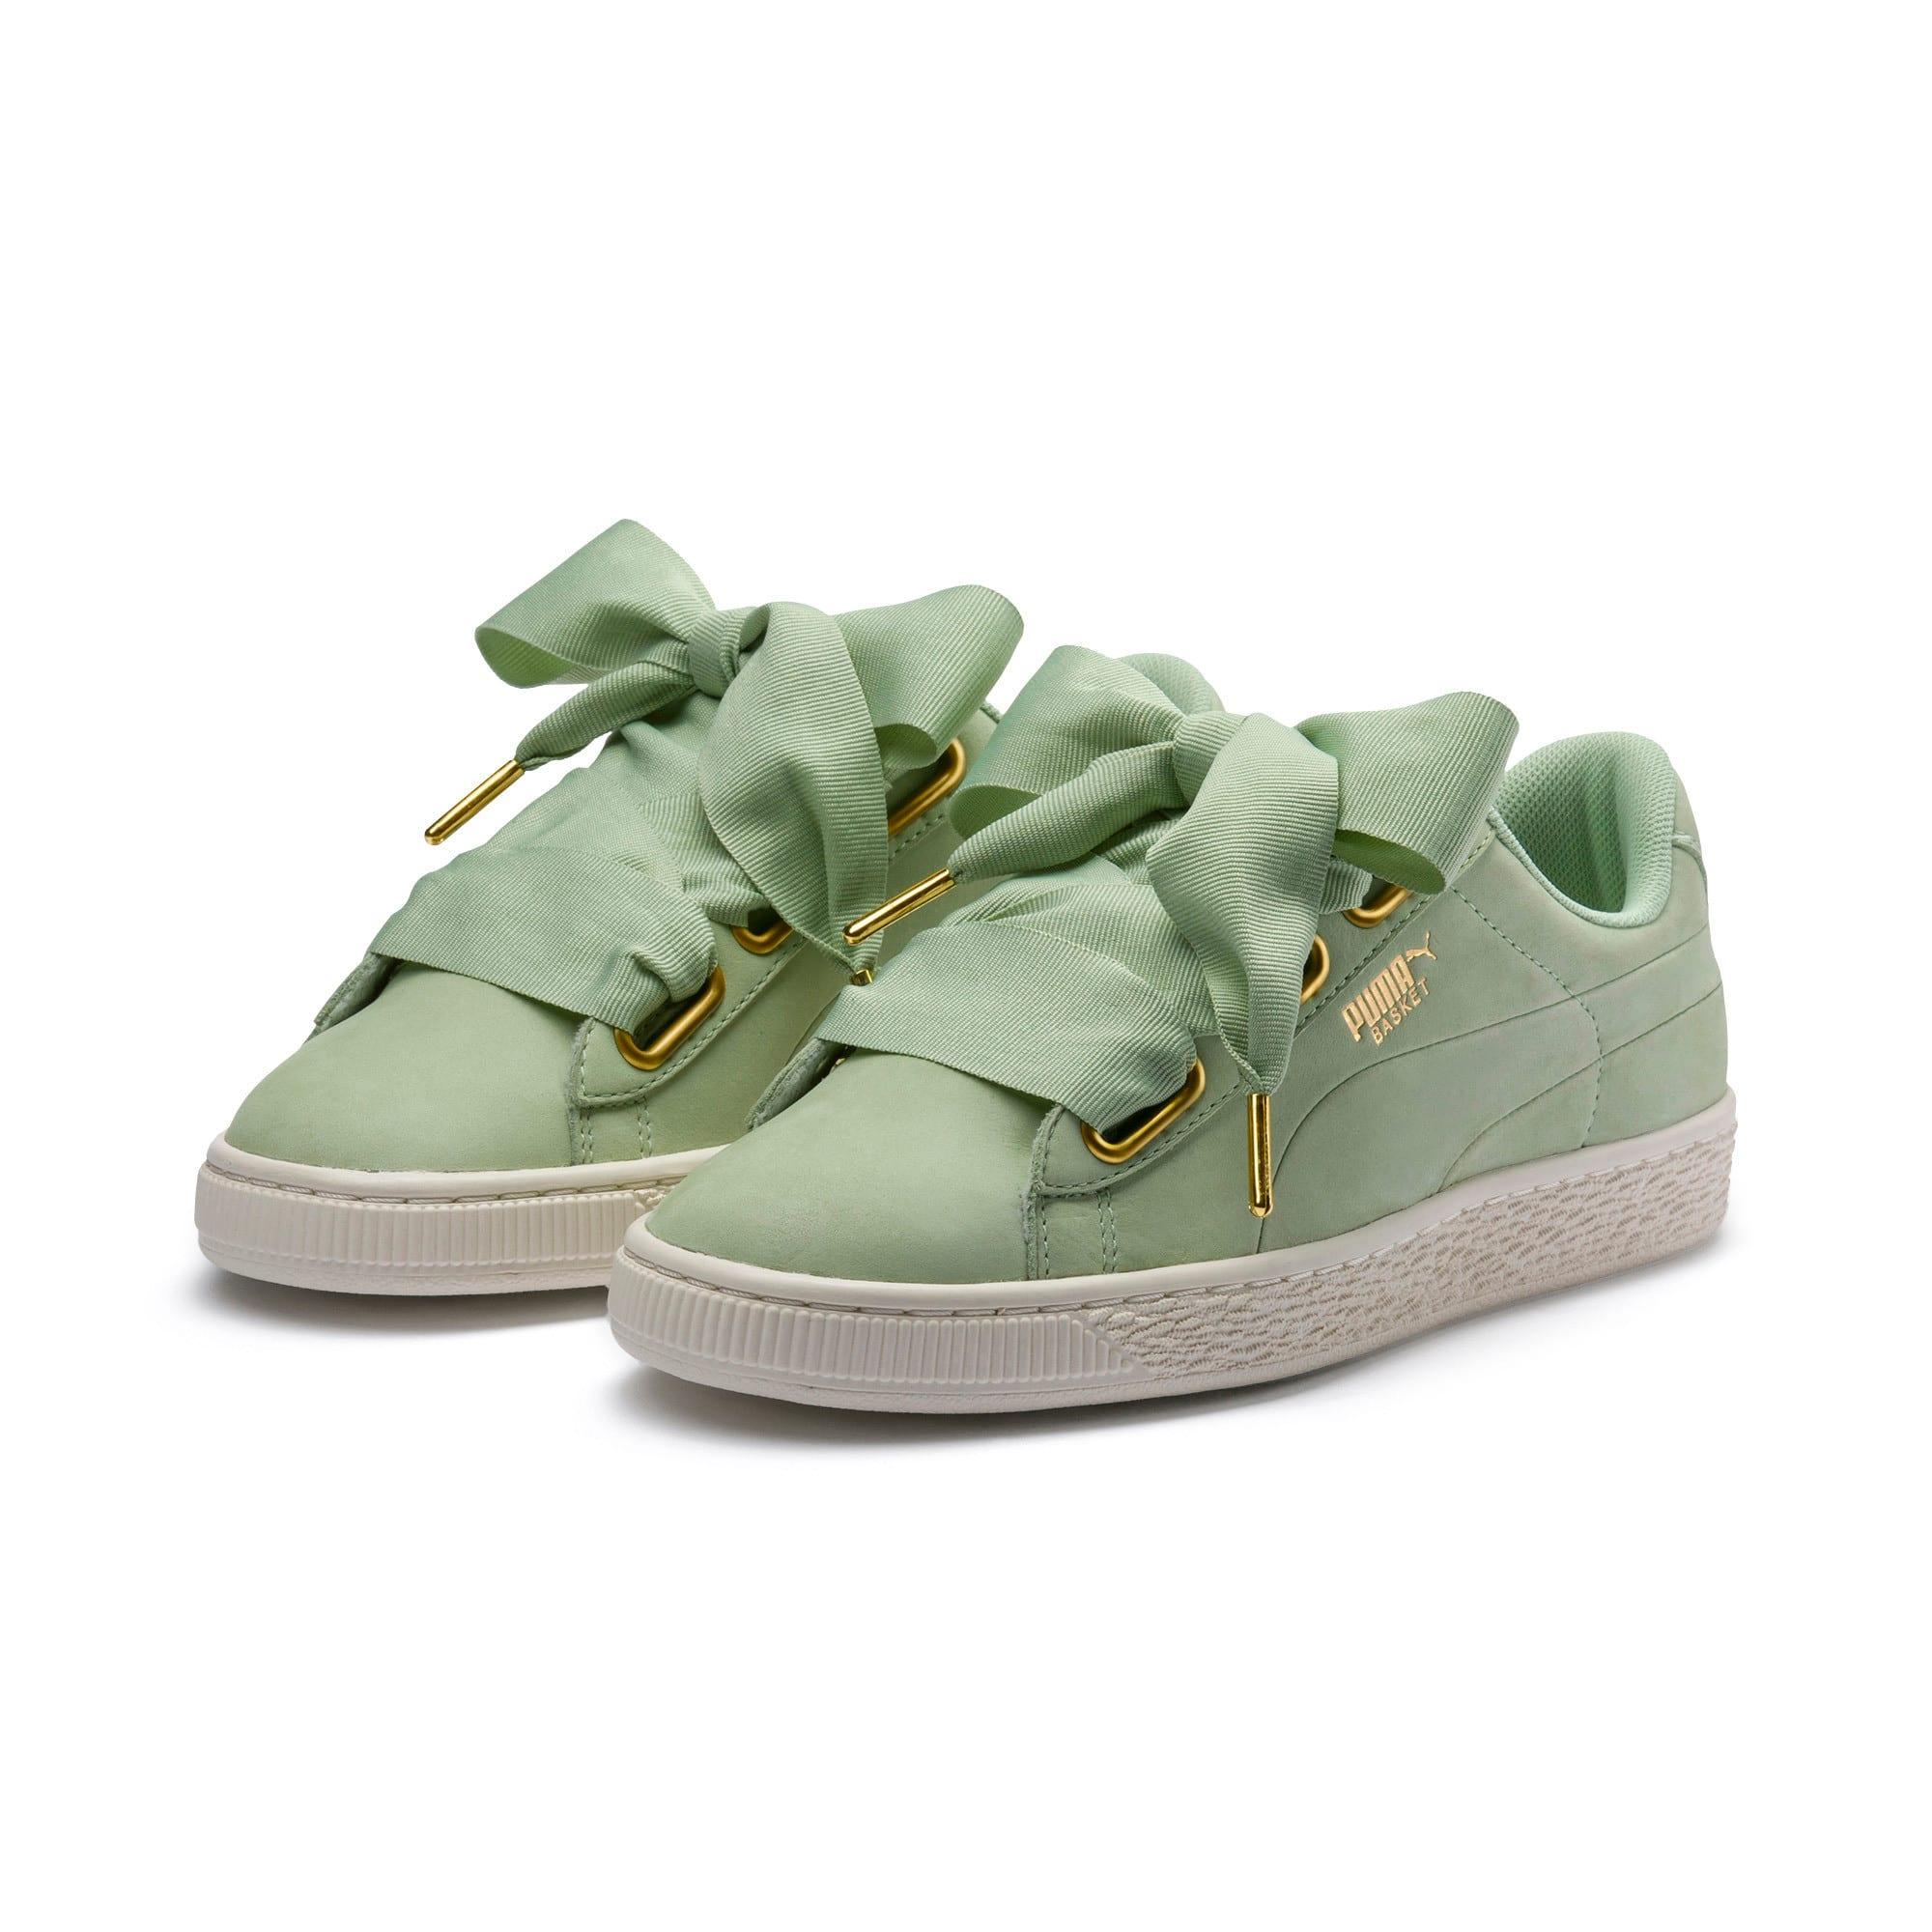 Thumbnail 2 of Basket Heart Soft Women's Sneakers, Smoke Green-Marshmallow, medium